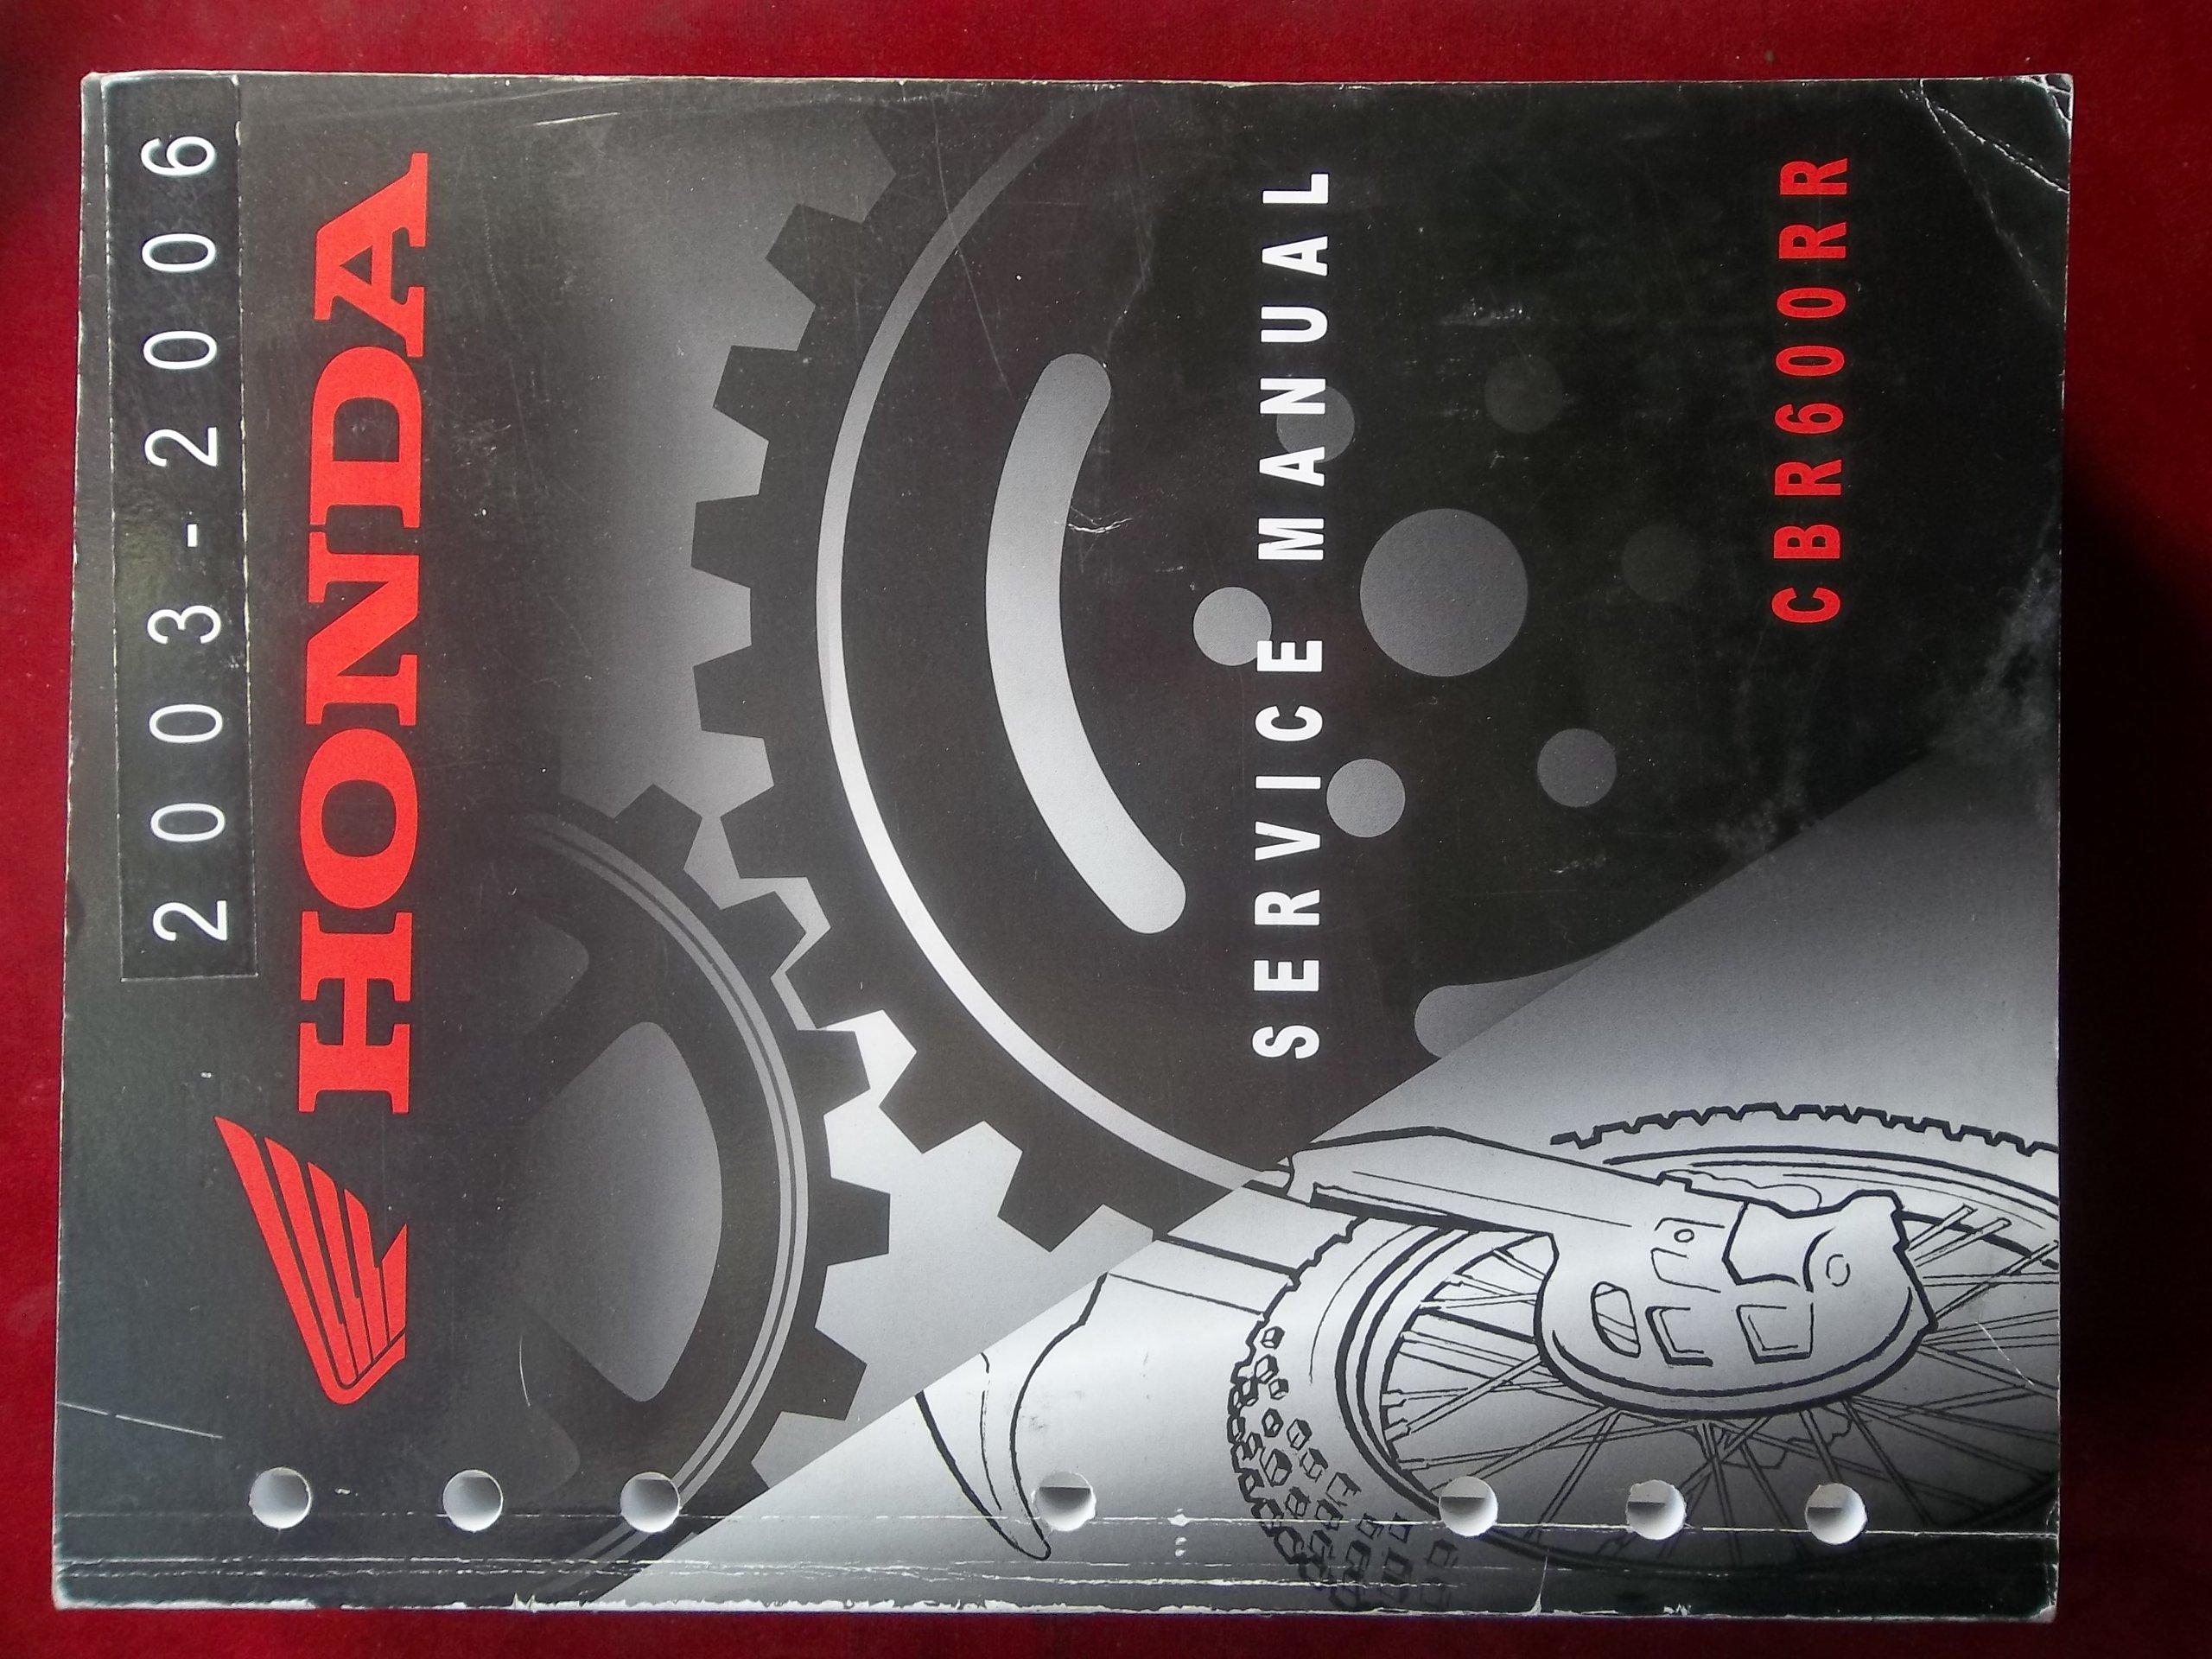 2003 2004 2005 2006 Cbr600rr Cbr 600 Rr Honda Service Shop Repair